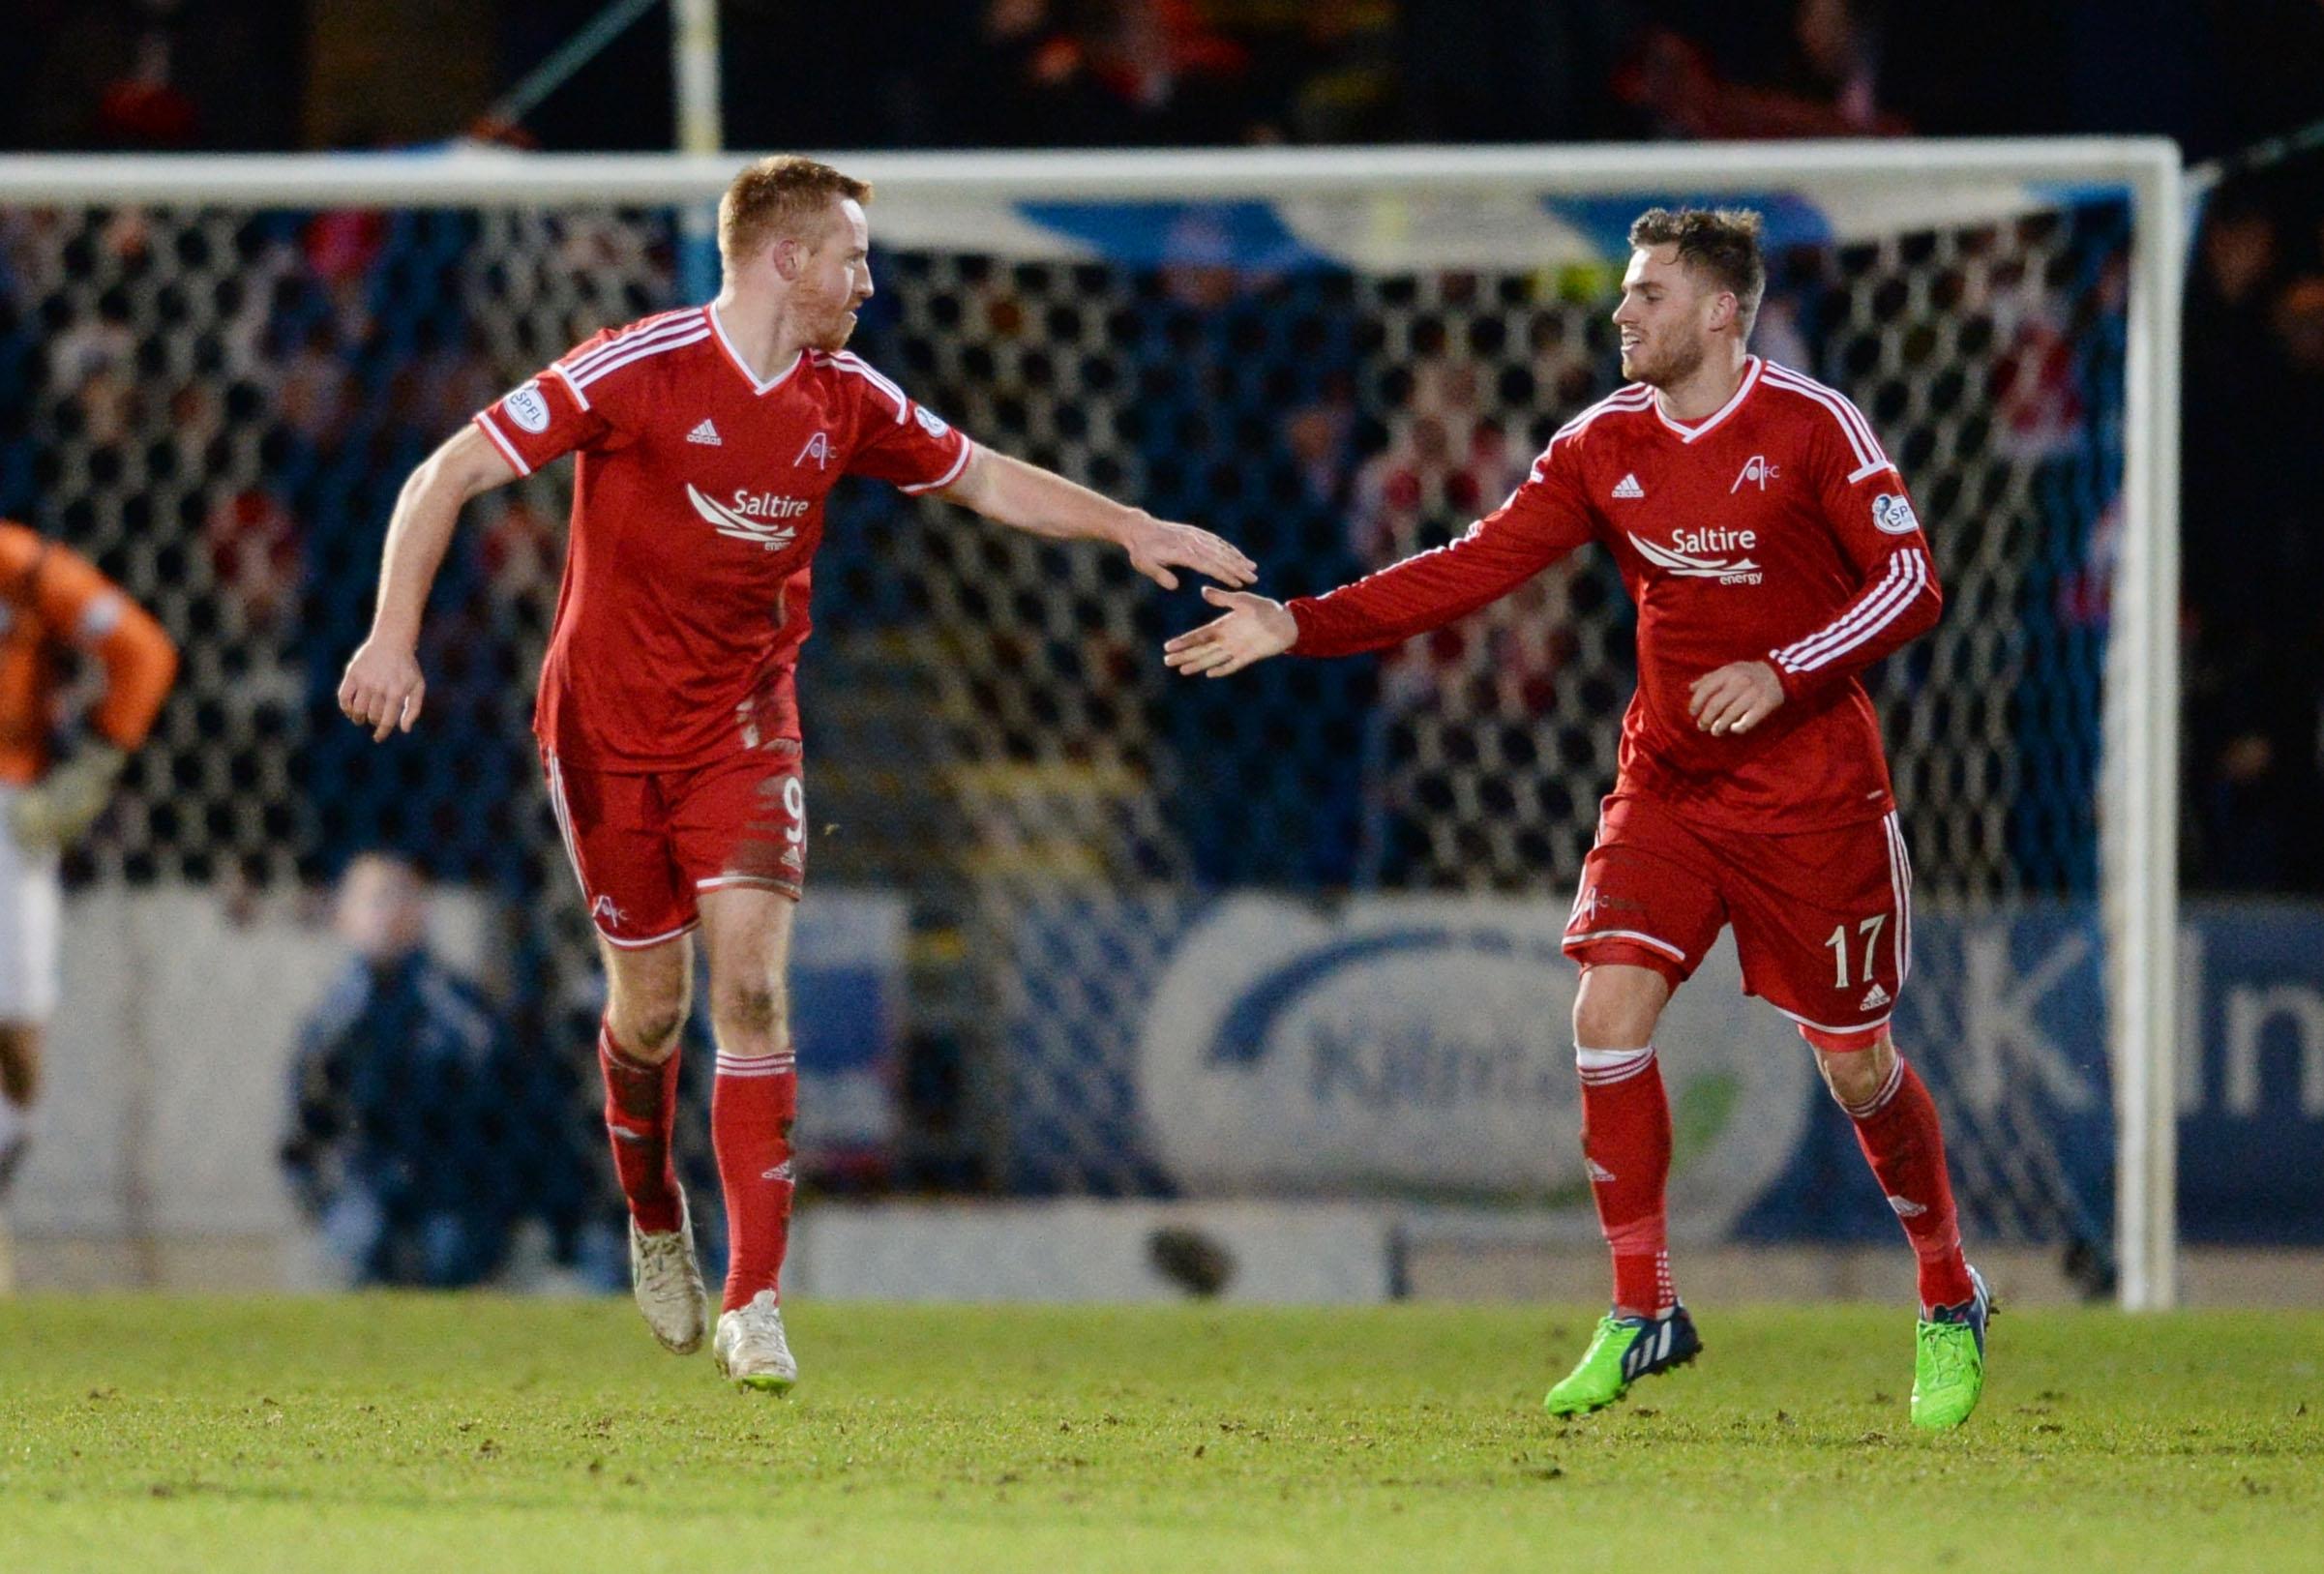 David Goodwillie congratulates Adam Rooney on his goal